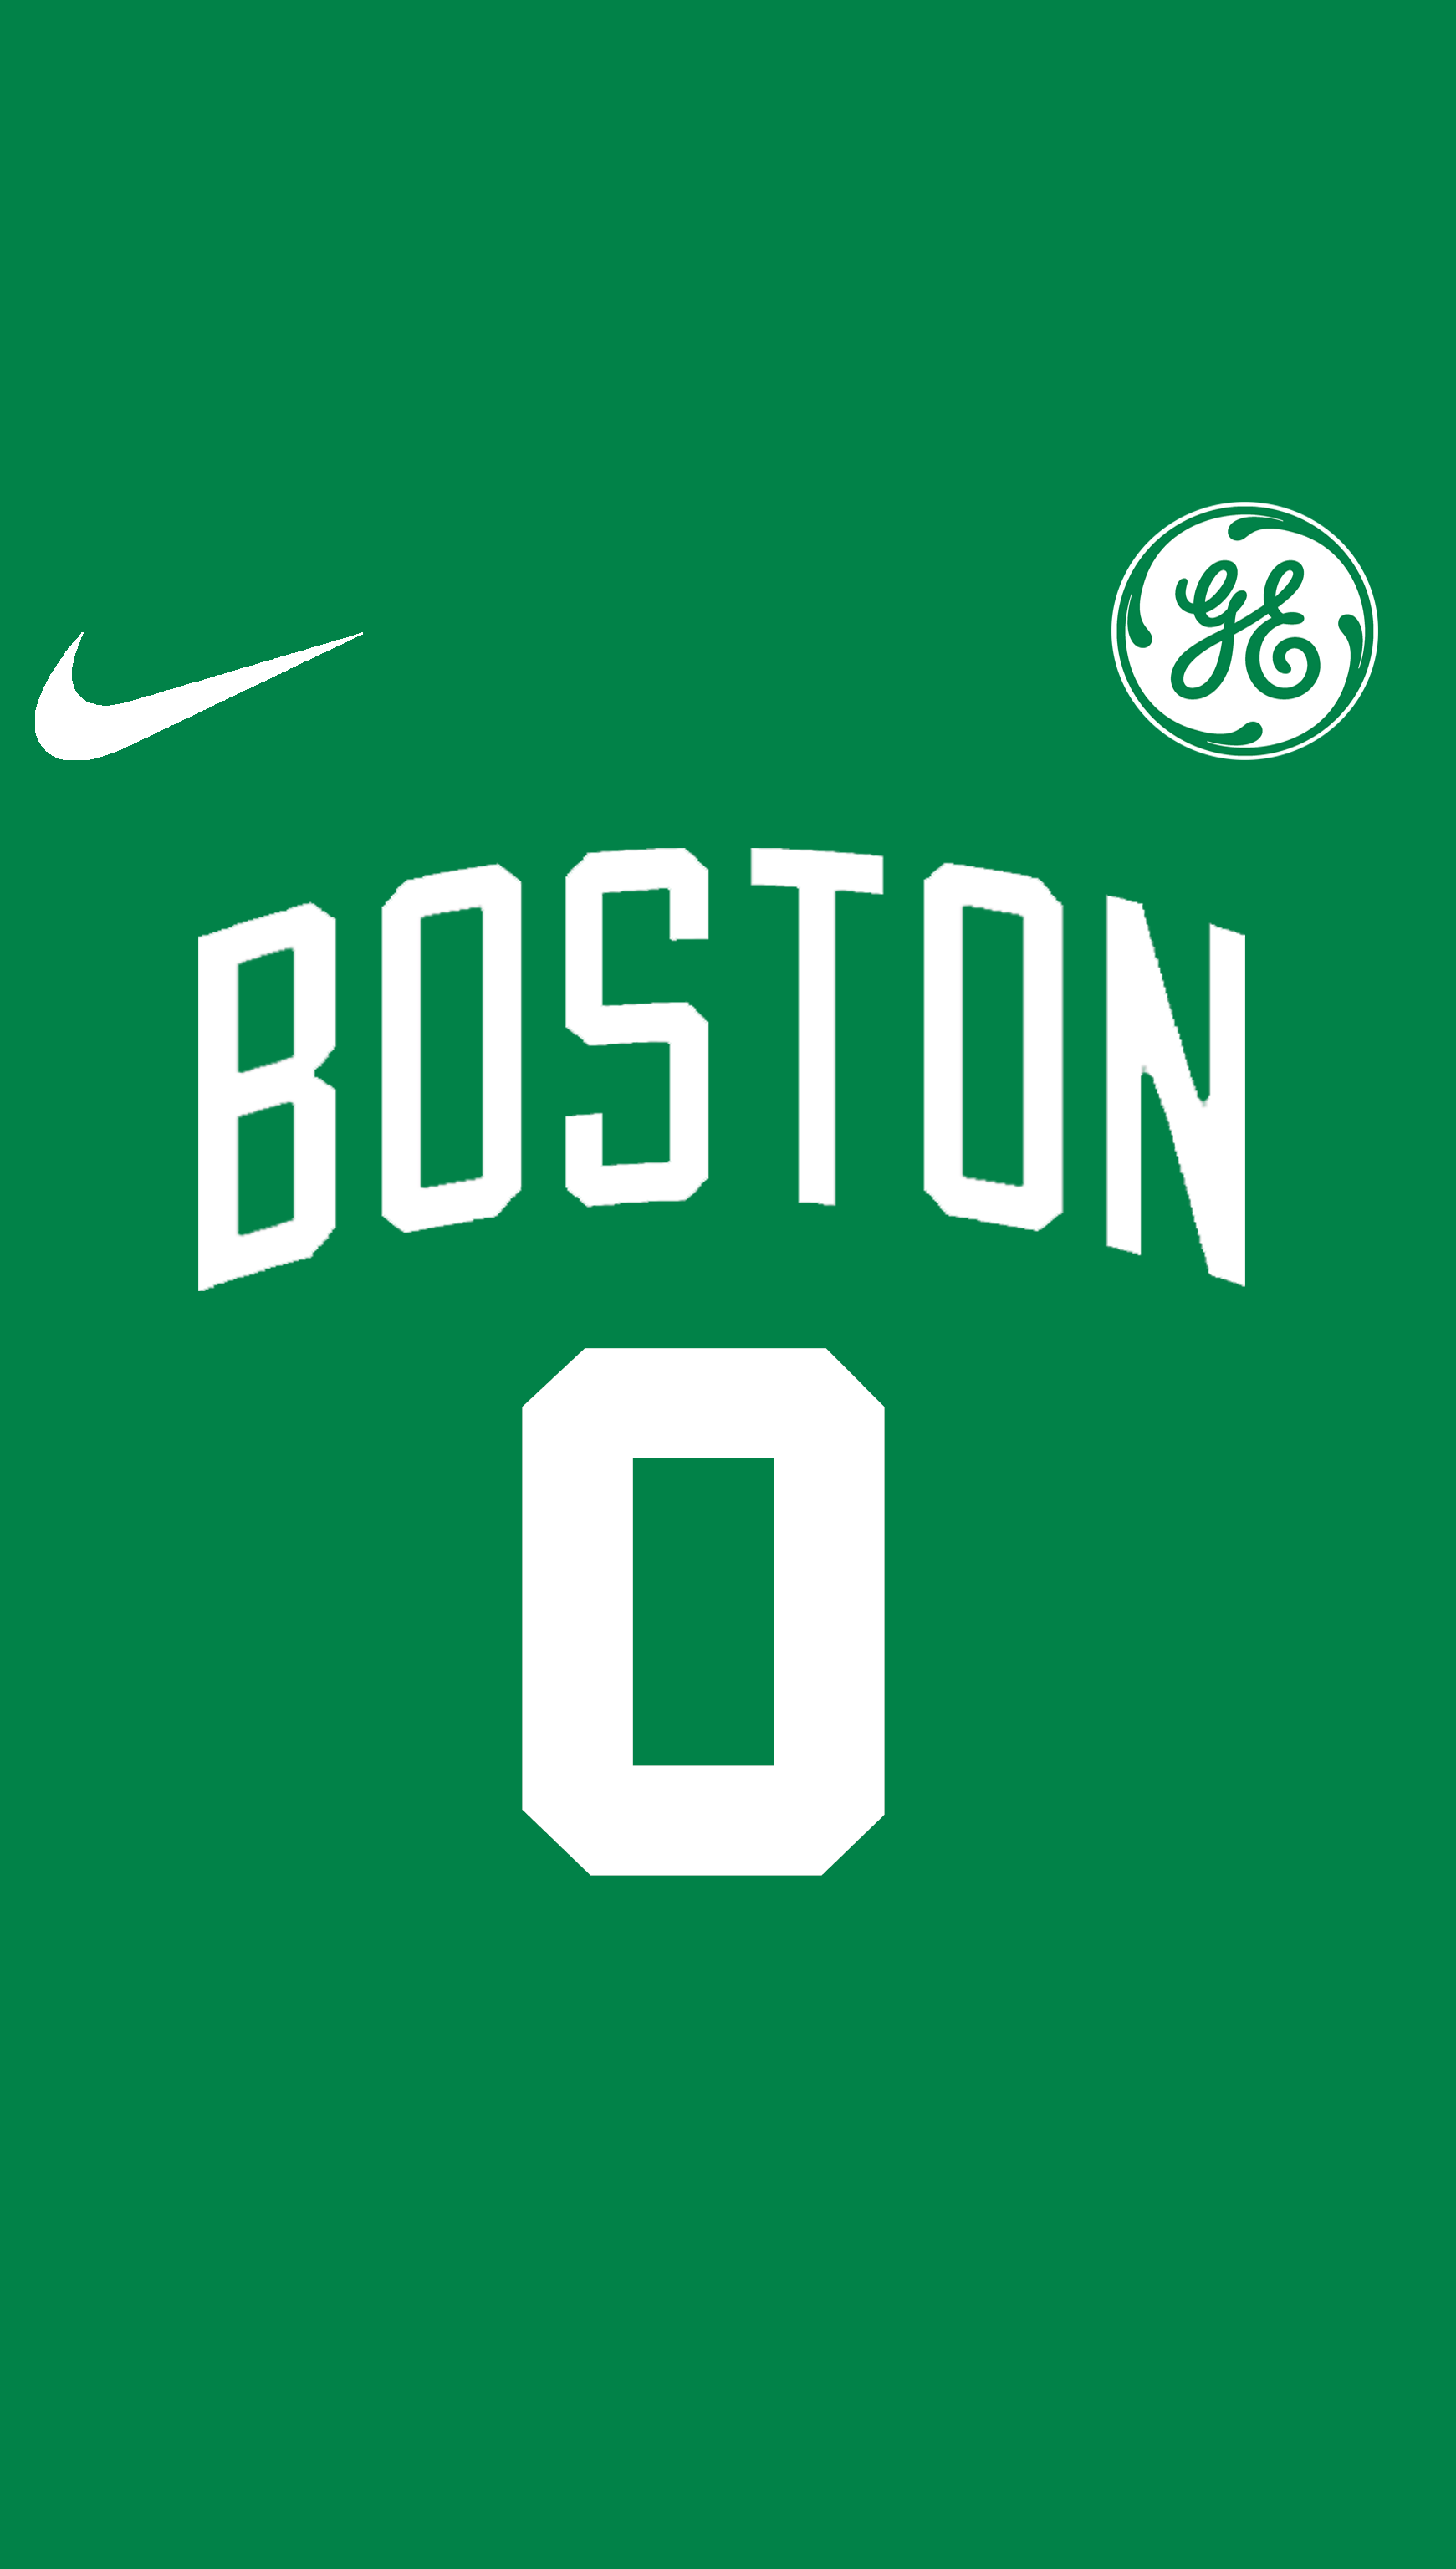 Pin By Guipeixoto On Boston Celtics Wallpaper Boston Celtics Wallpaper Boston Celtics Nba Jersey [ 3072 x 1741 Pixel ]